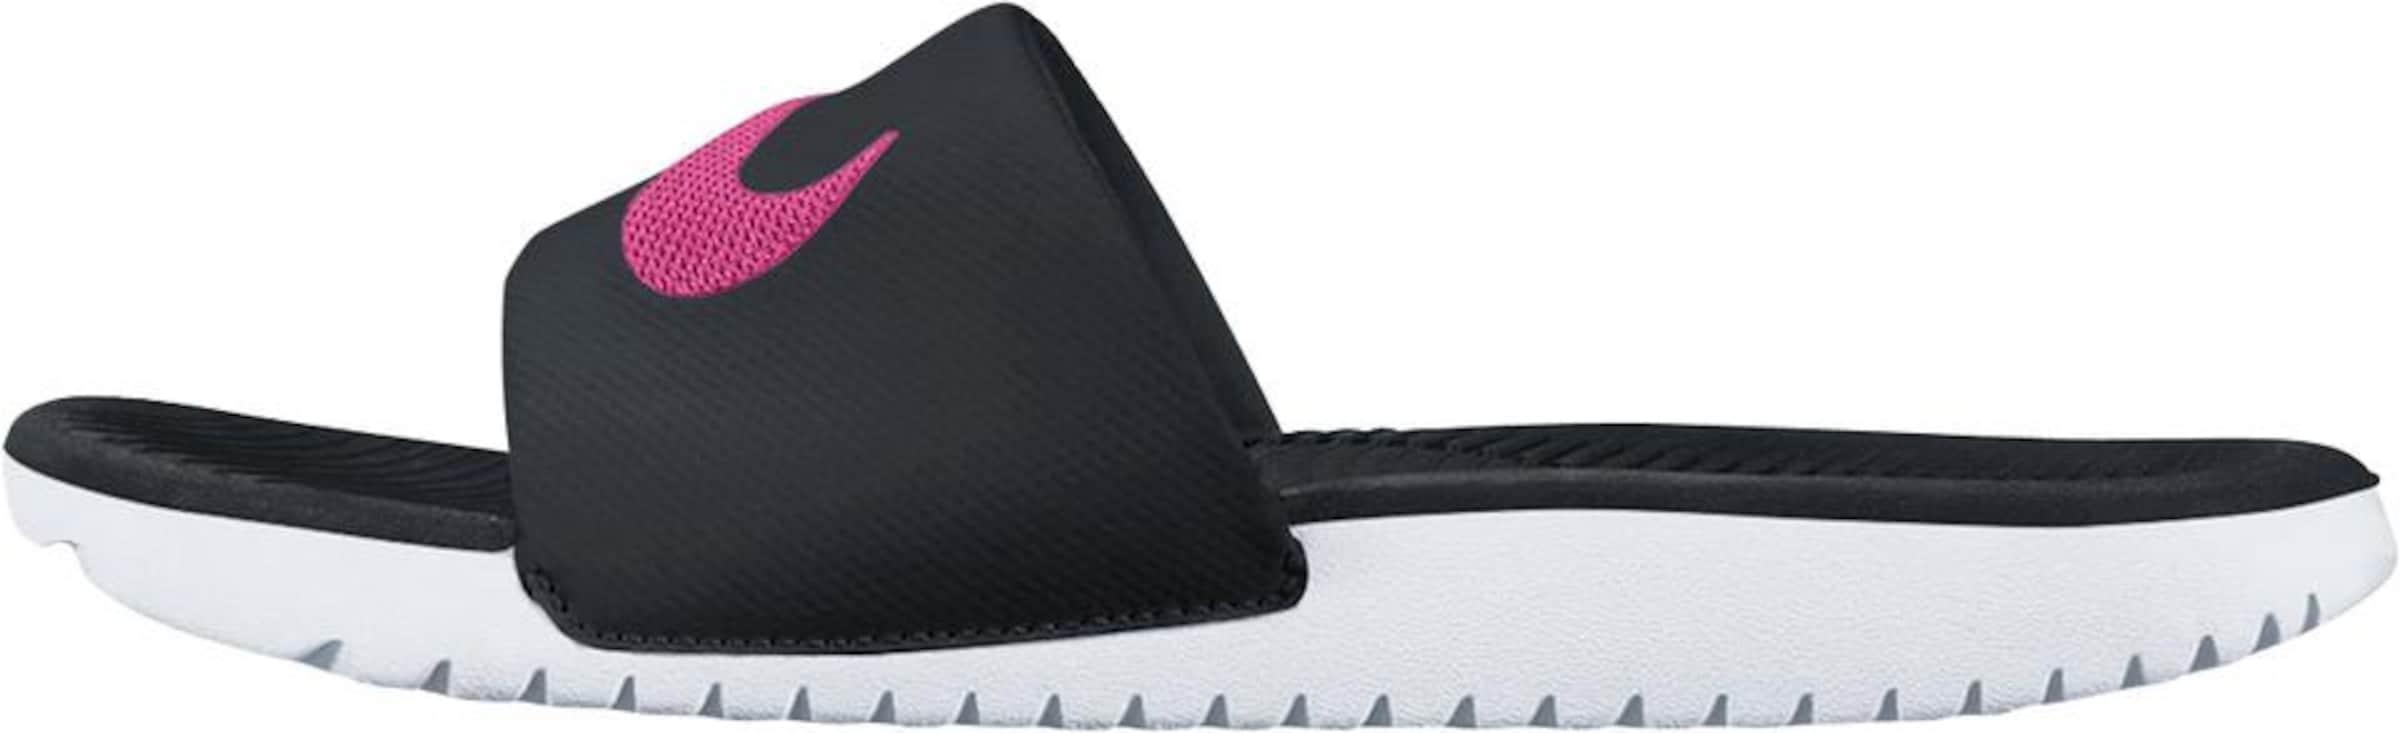 Nike Sportswear Badesandale »Wmns Kawa Slide«